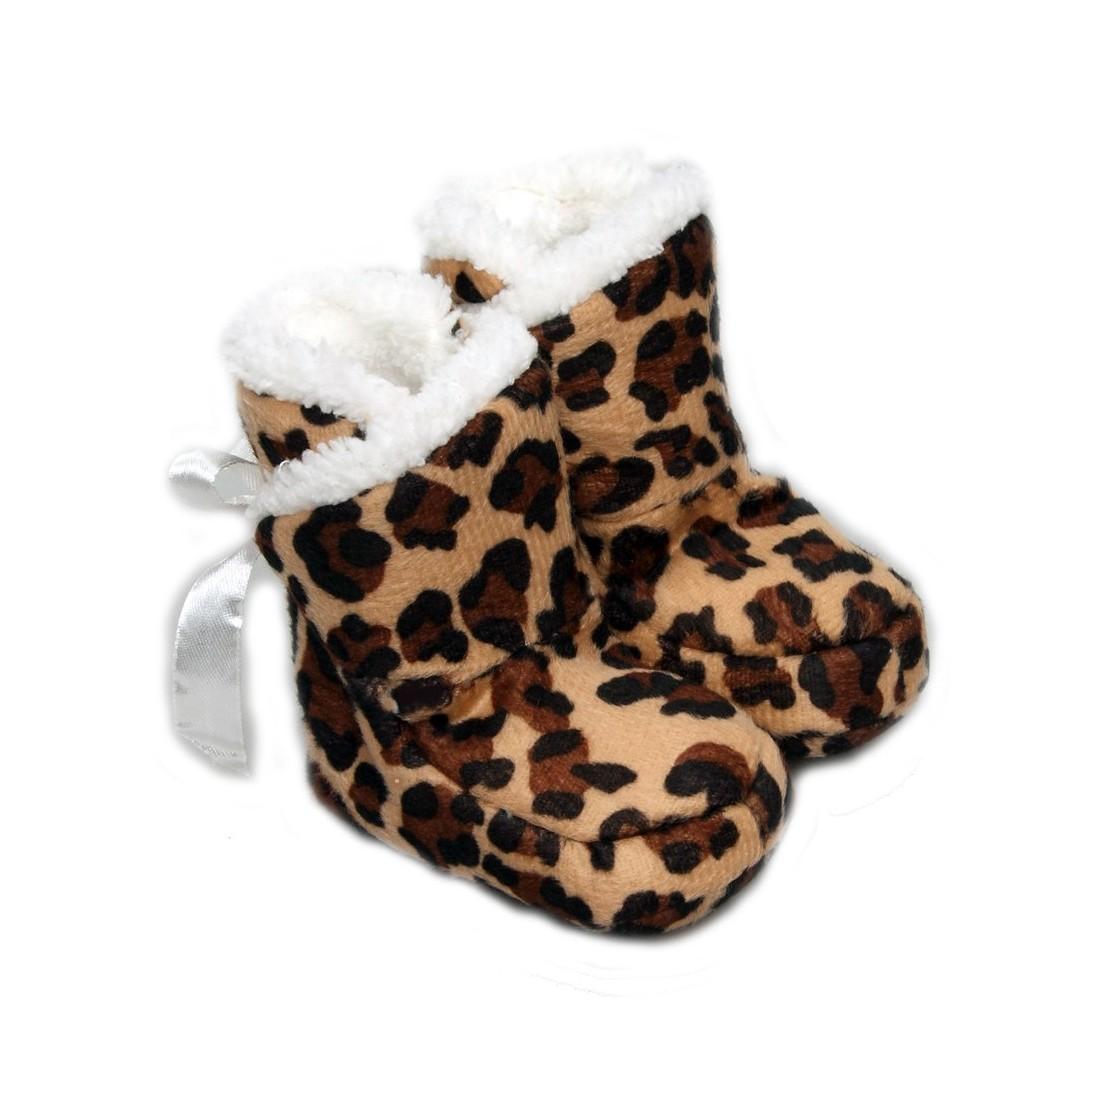 cadeau de naissance original vetement bebe original sac a langer gaspard et zoe. Black Bedroom Furniture Sets. Home Design Ideas